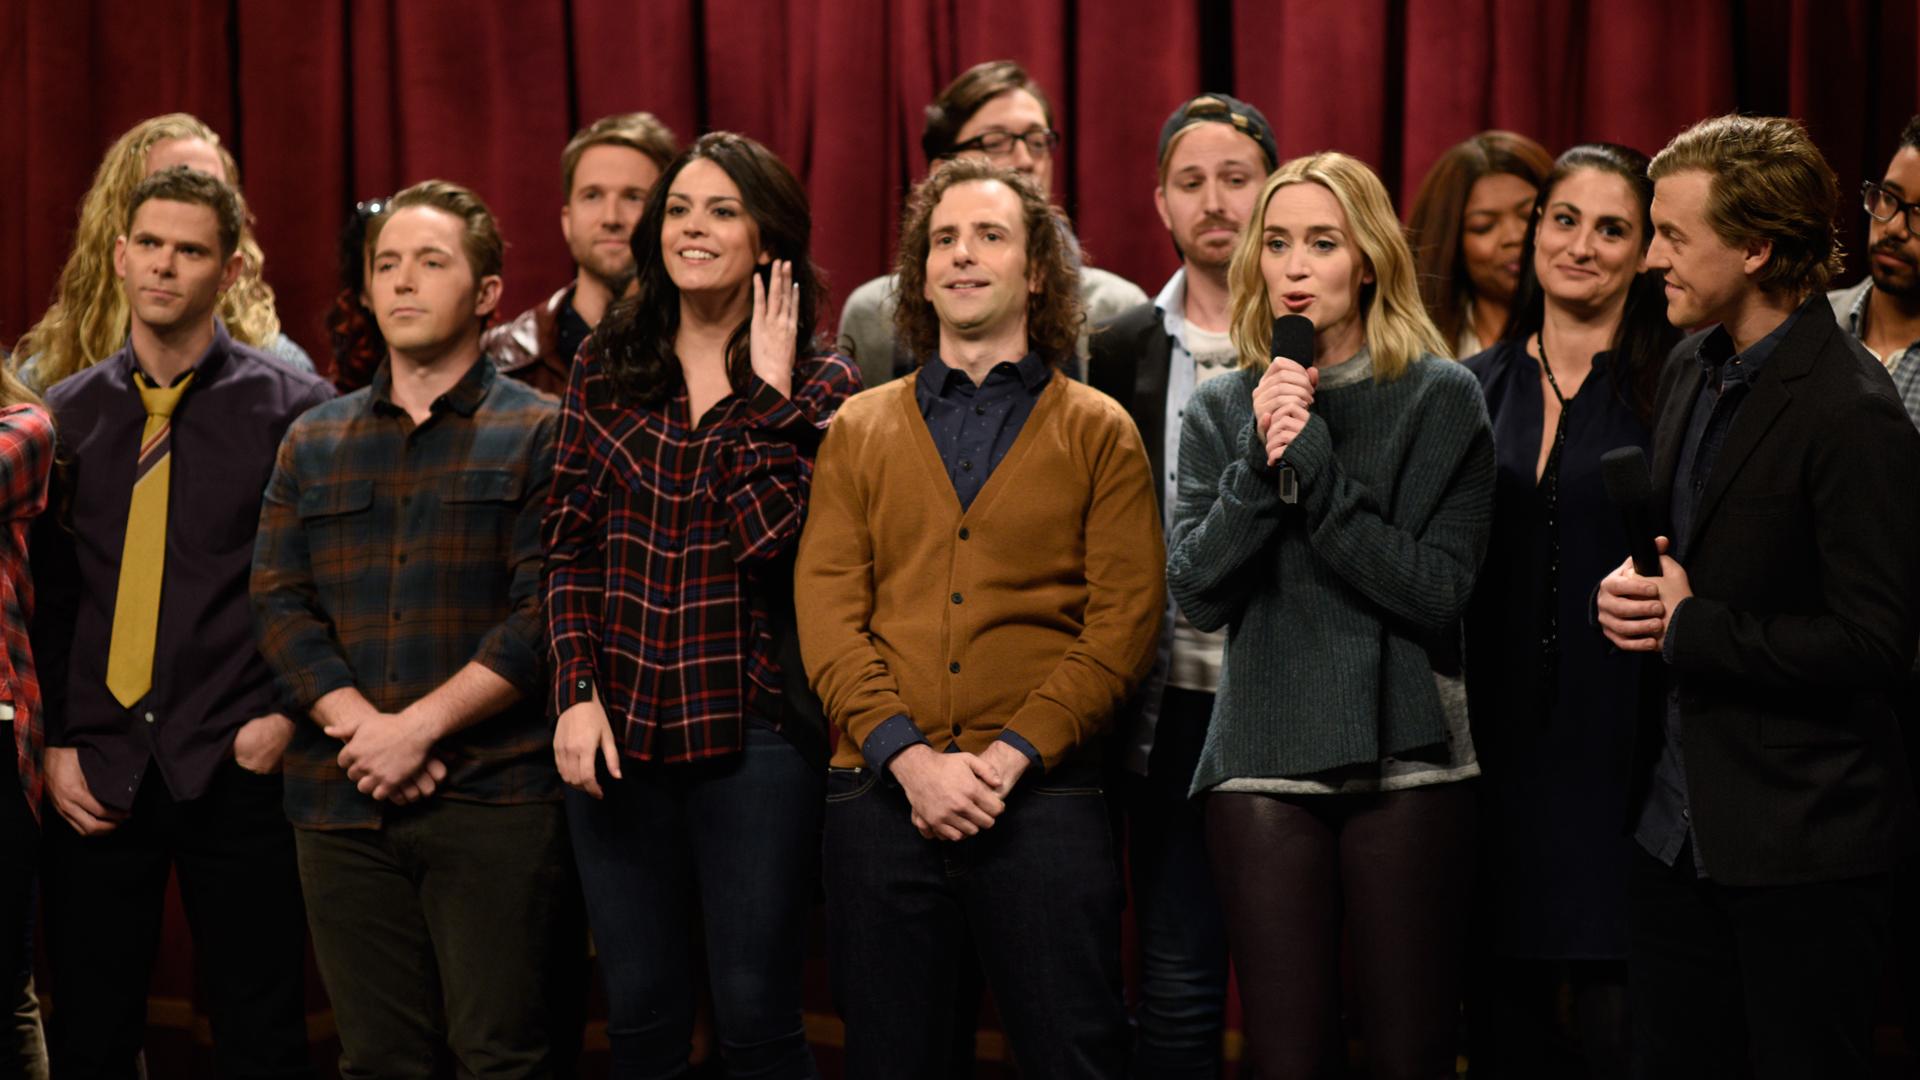 Watch Short Film From Saturday Night Live - NBC.com